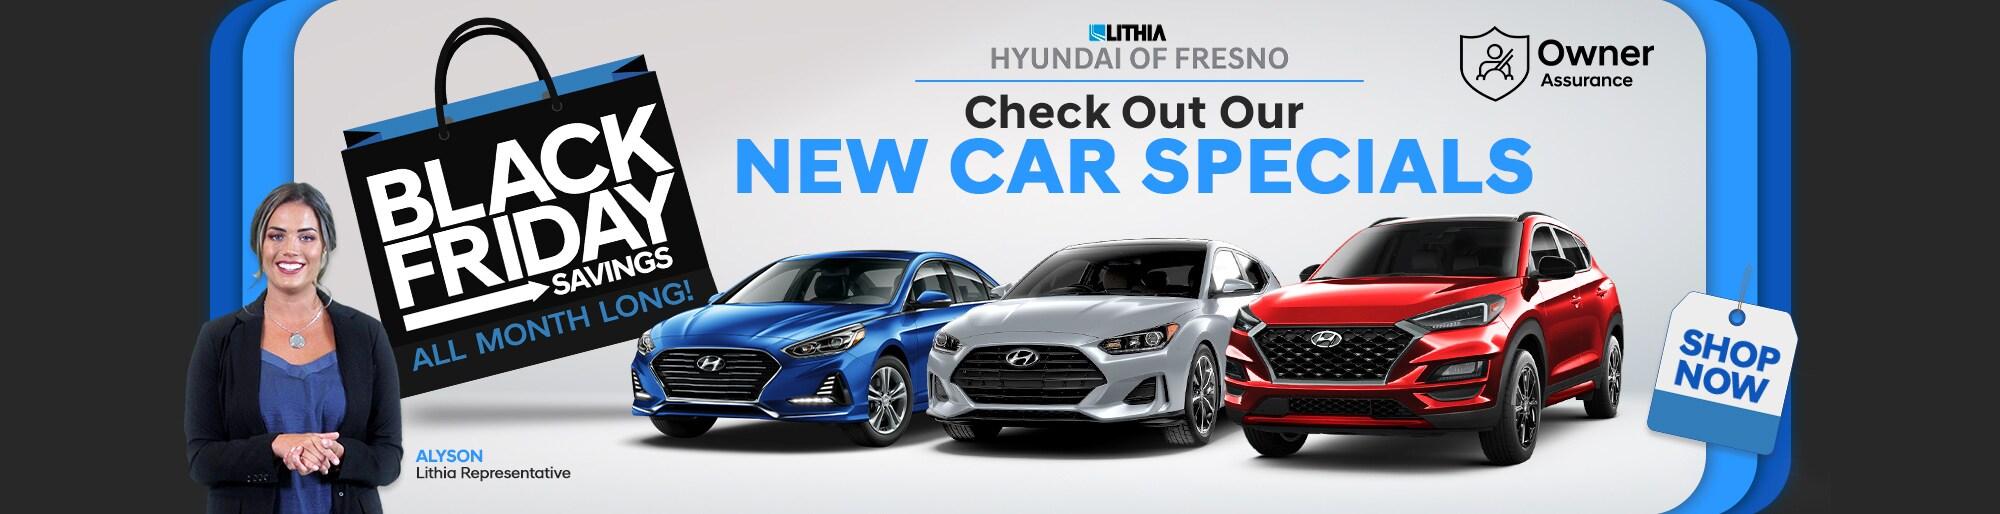 Lithia Hyundai Fresno >> New Used Car Dealer In Fresno Ca Lithia Hyundai Of